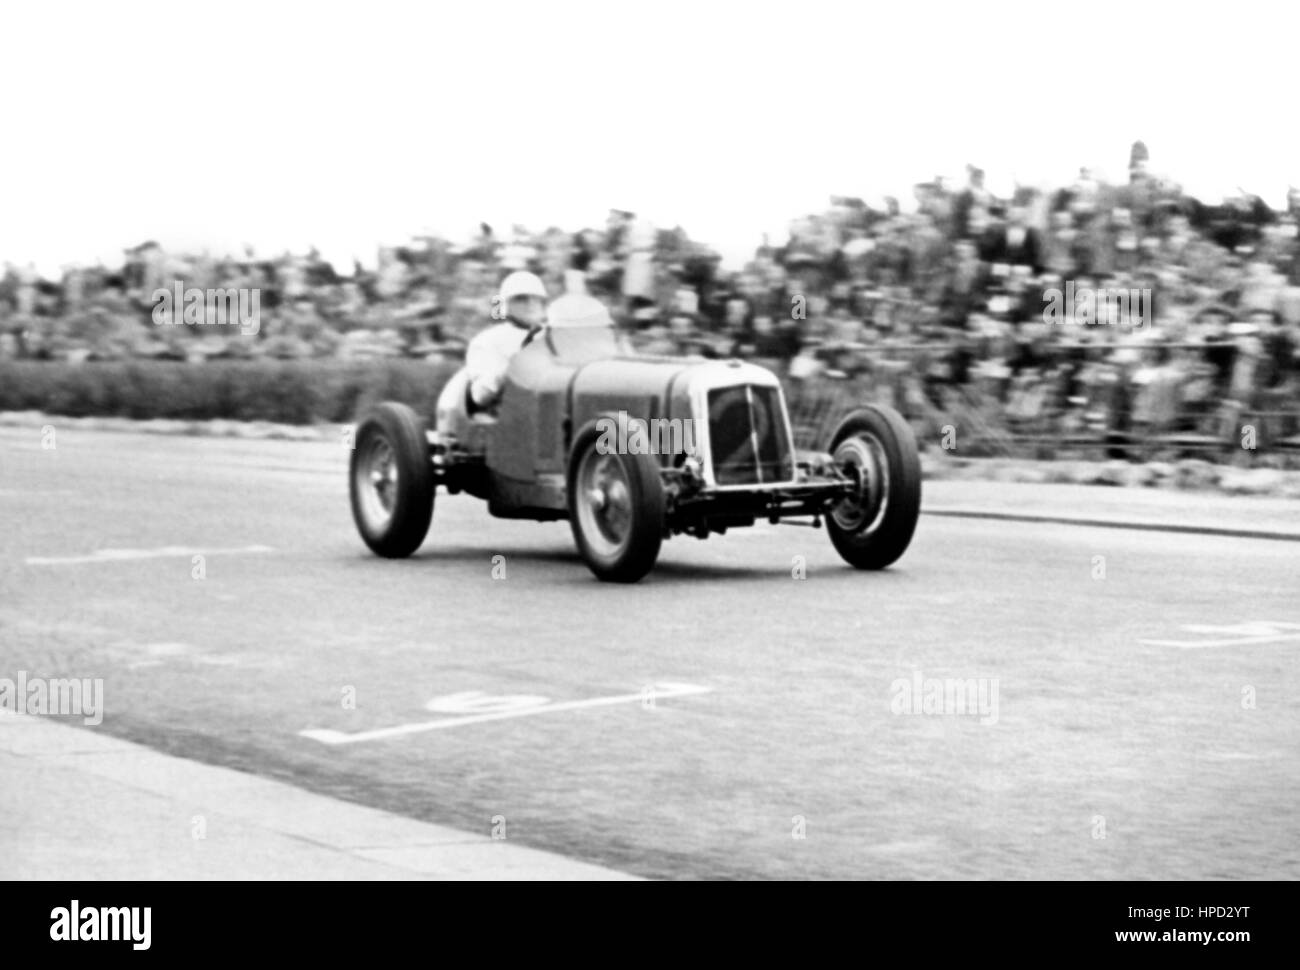 1948-ERA Jersey-Straßenrennen Stockbild